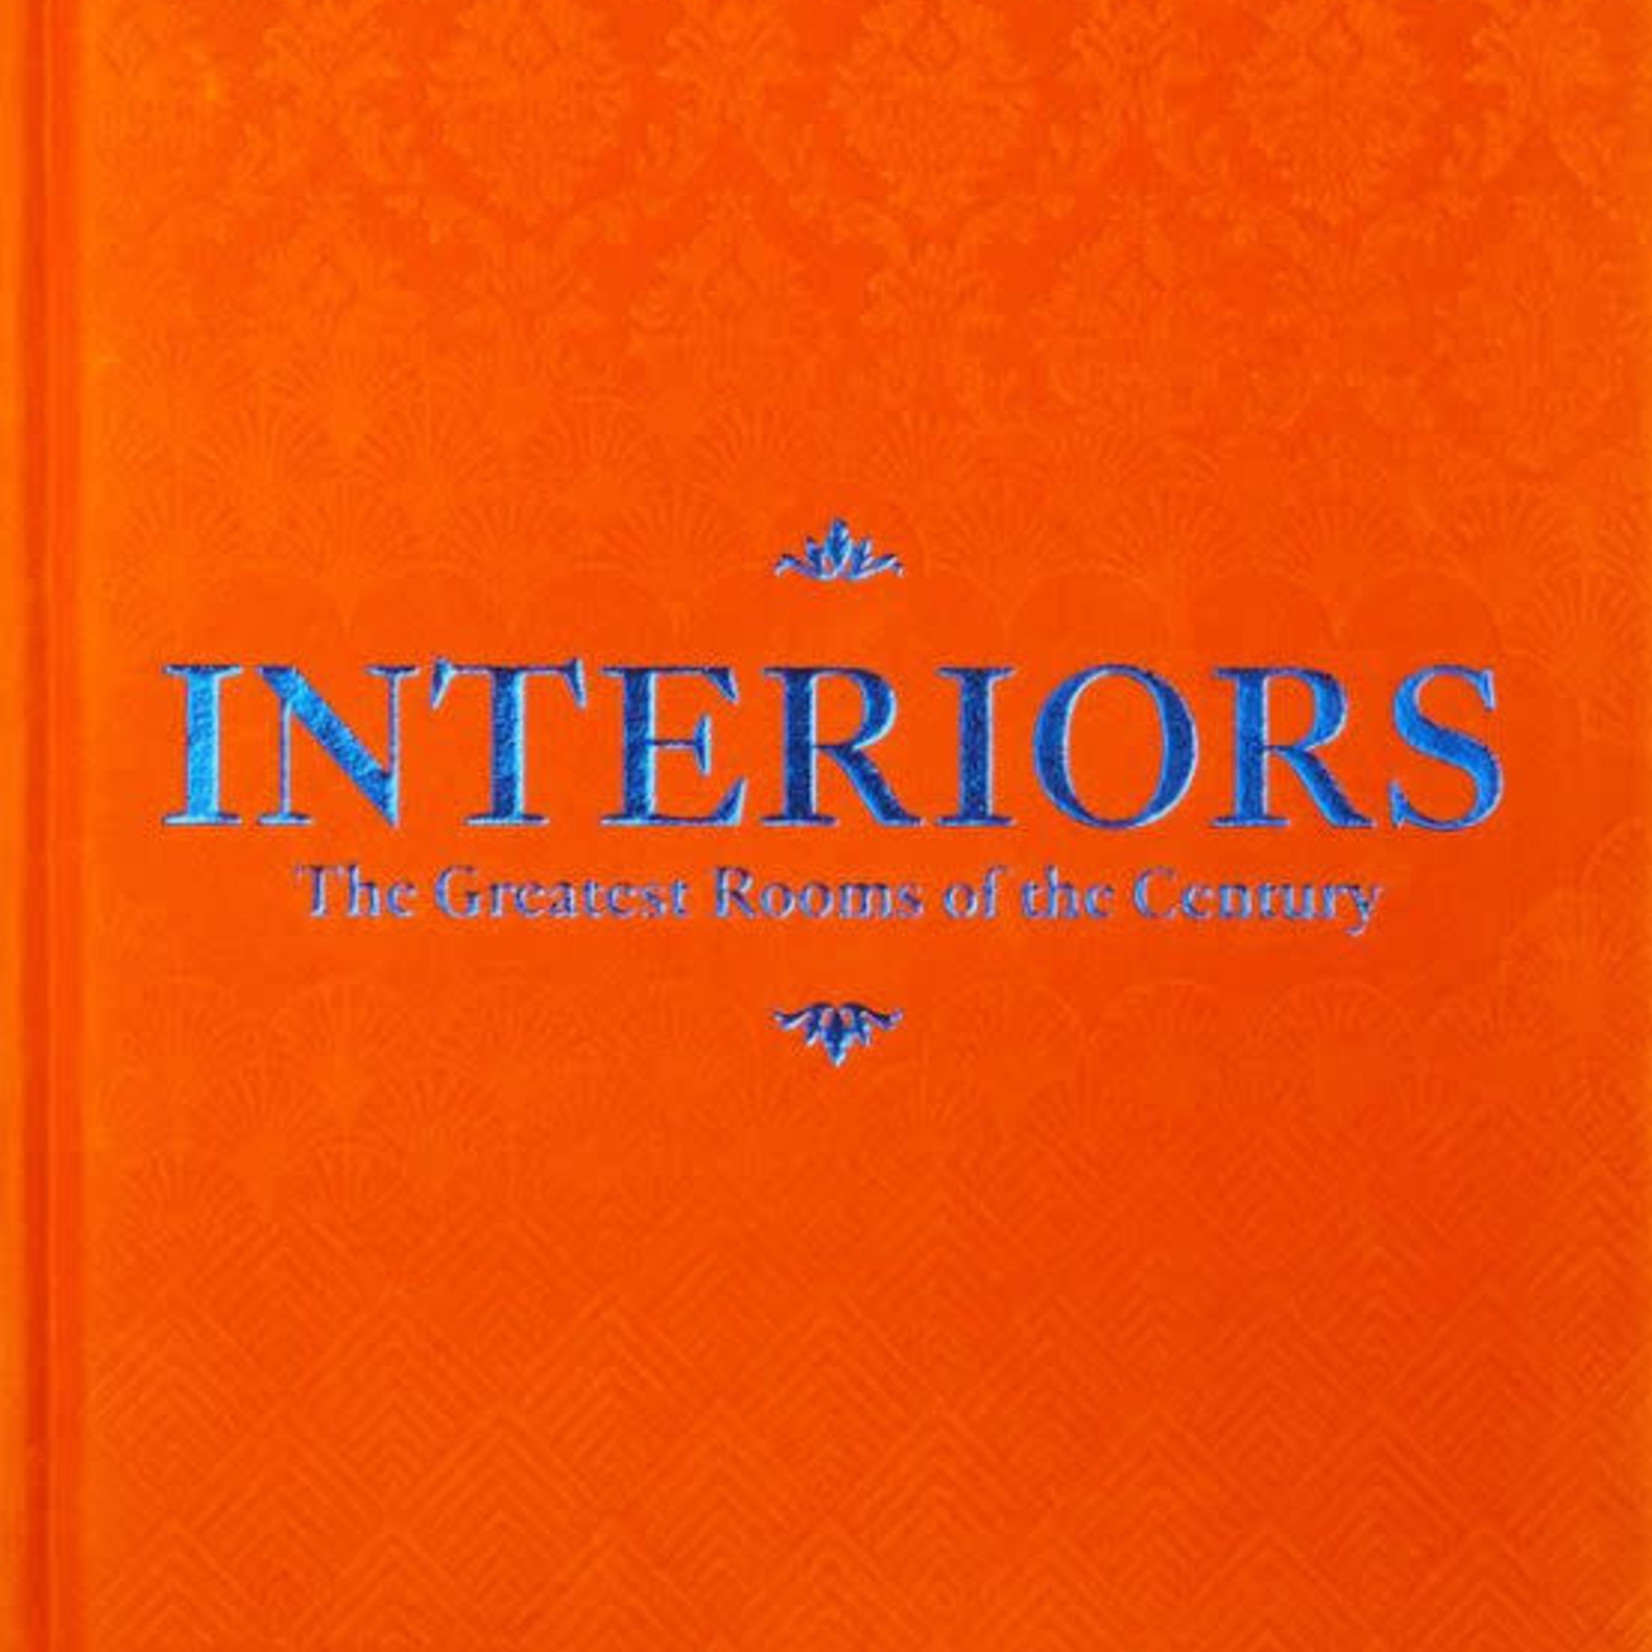 Daniel Richards Interiors The Greatest Rooms of the Century - Orange